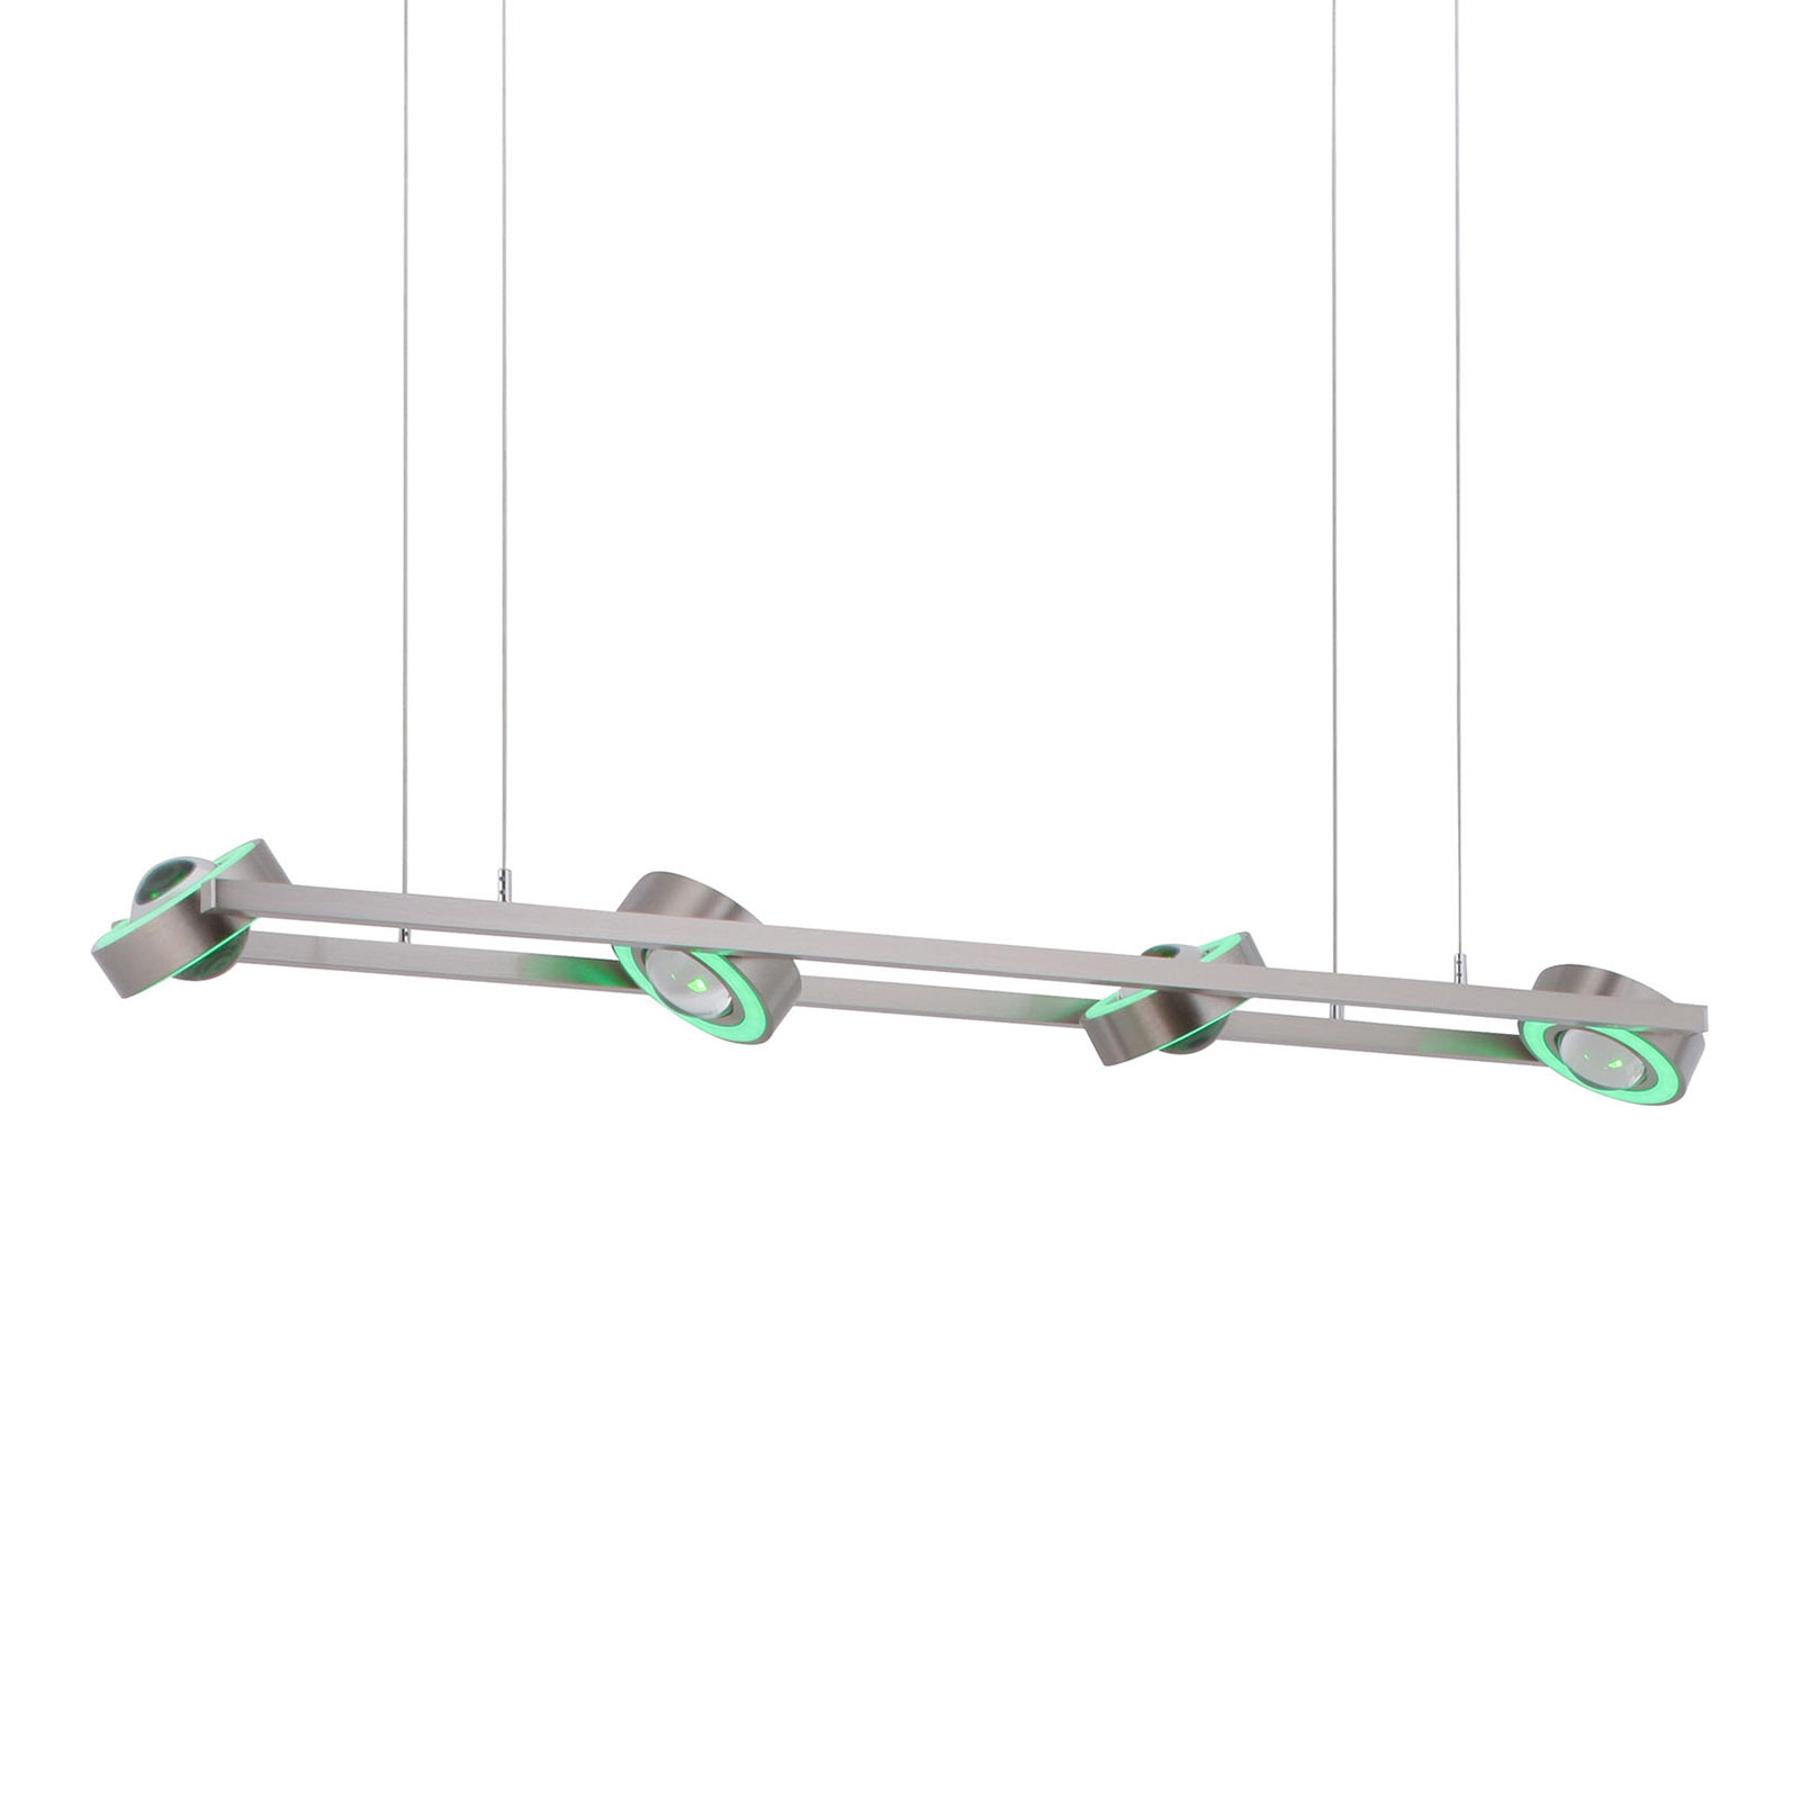 Paul Neuhaus Q-MIA LED-Hängeleuchte, stahl